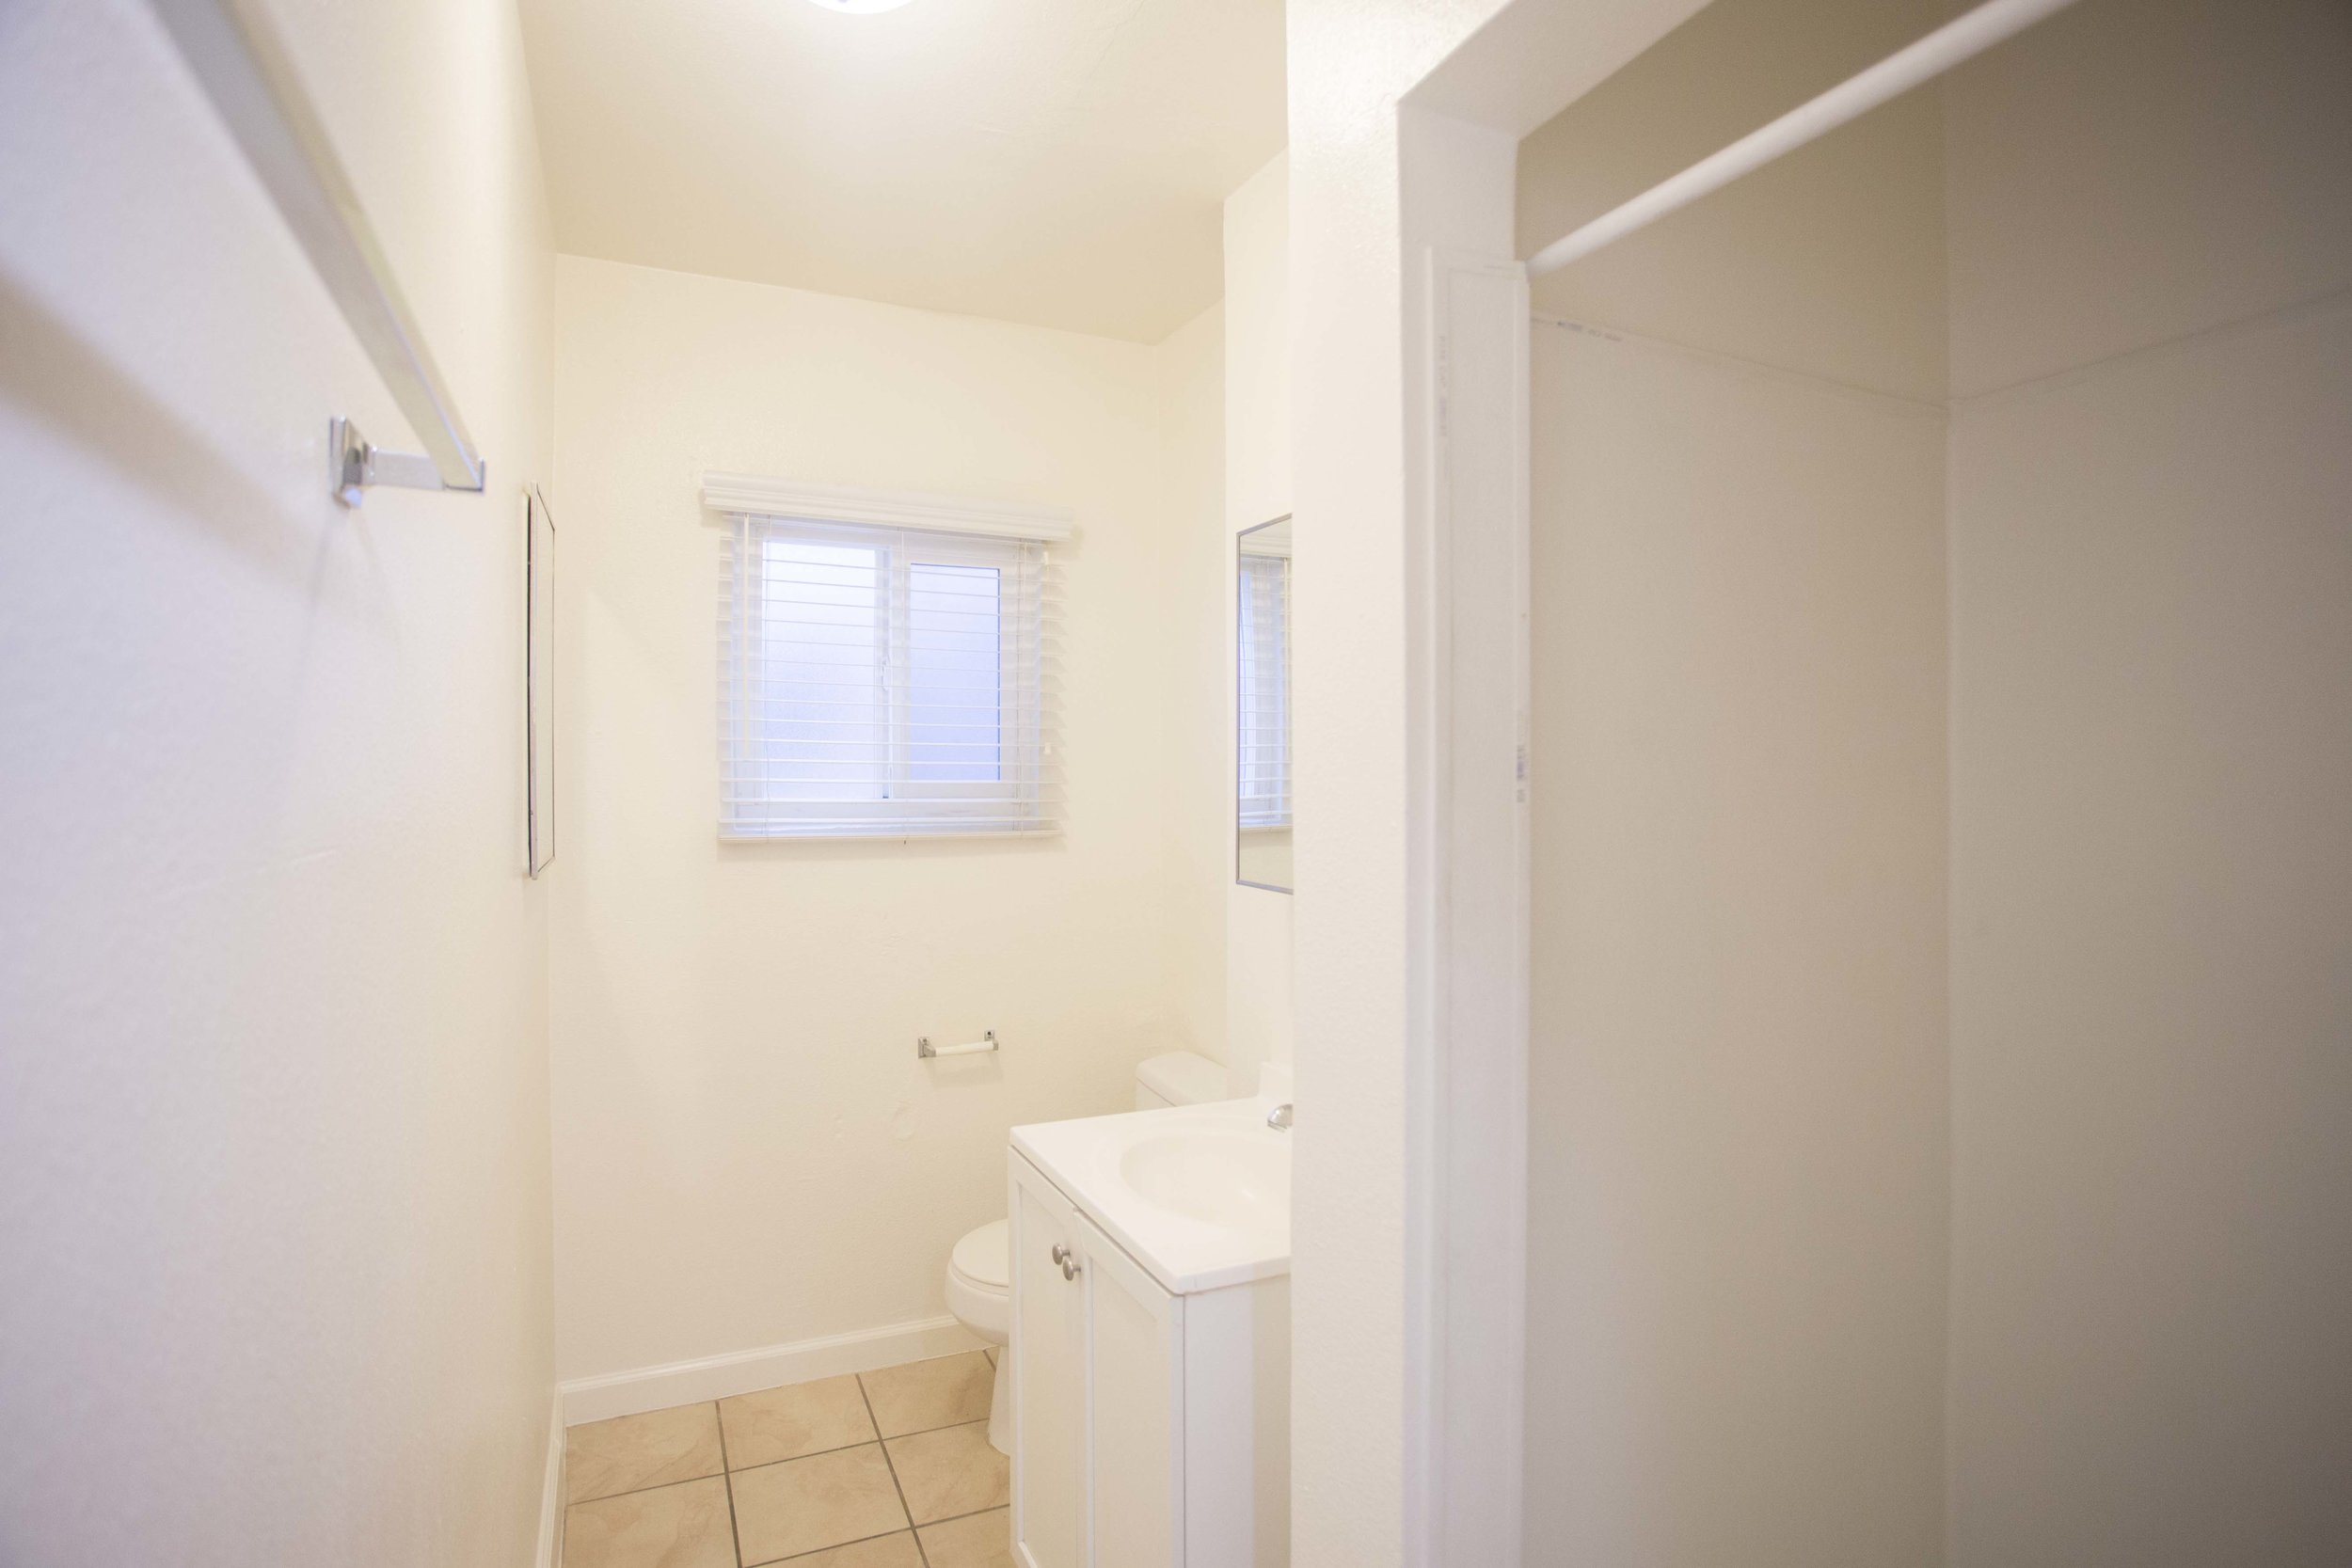 Image of bathroom inside East HOV Building